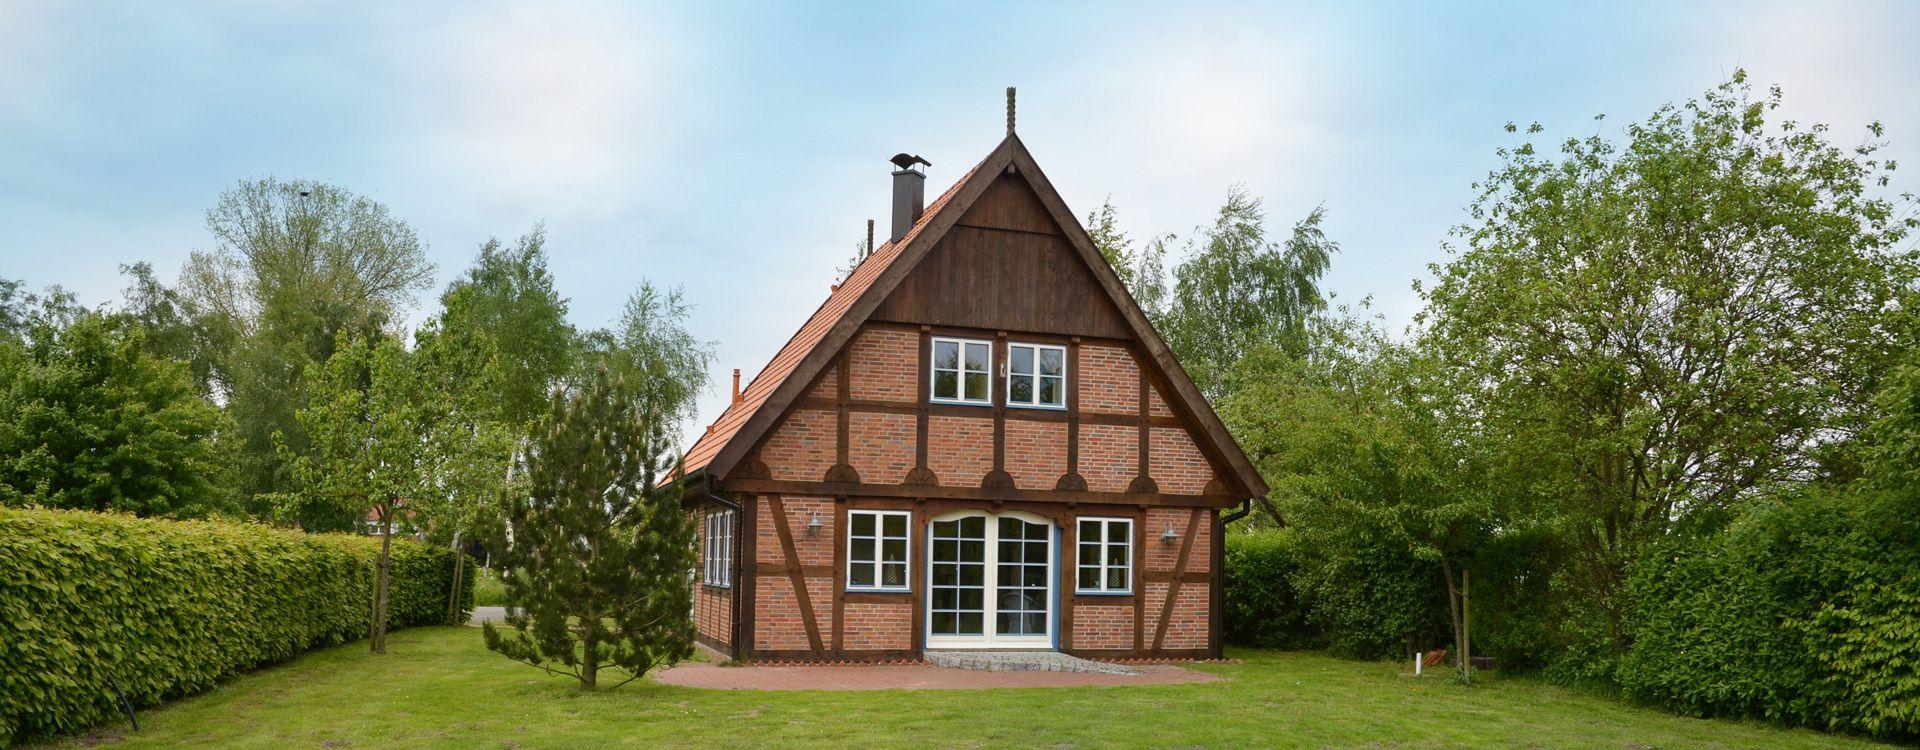 deutsche landhaus klassiker musterh user fachwerkhaus haus musterhaus und fachwerkhaus bauen. Black Bedroom Furniture Sets. Home Design Ideas